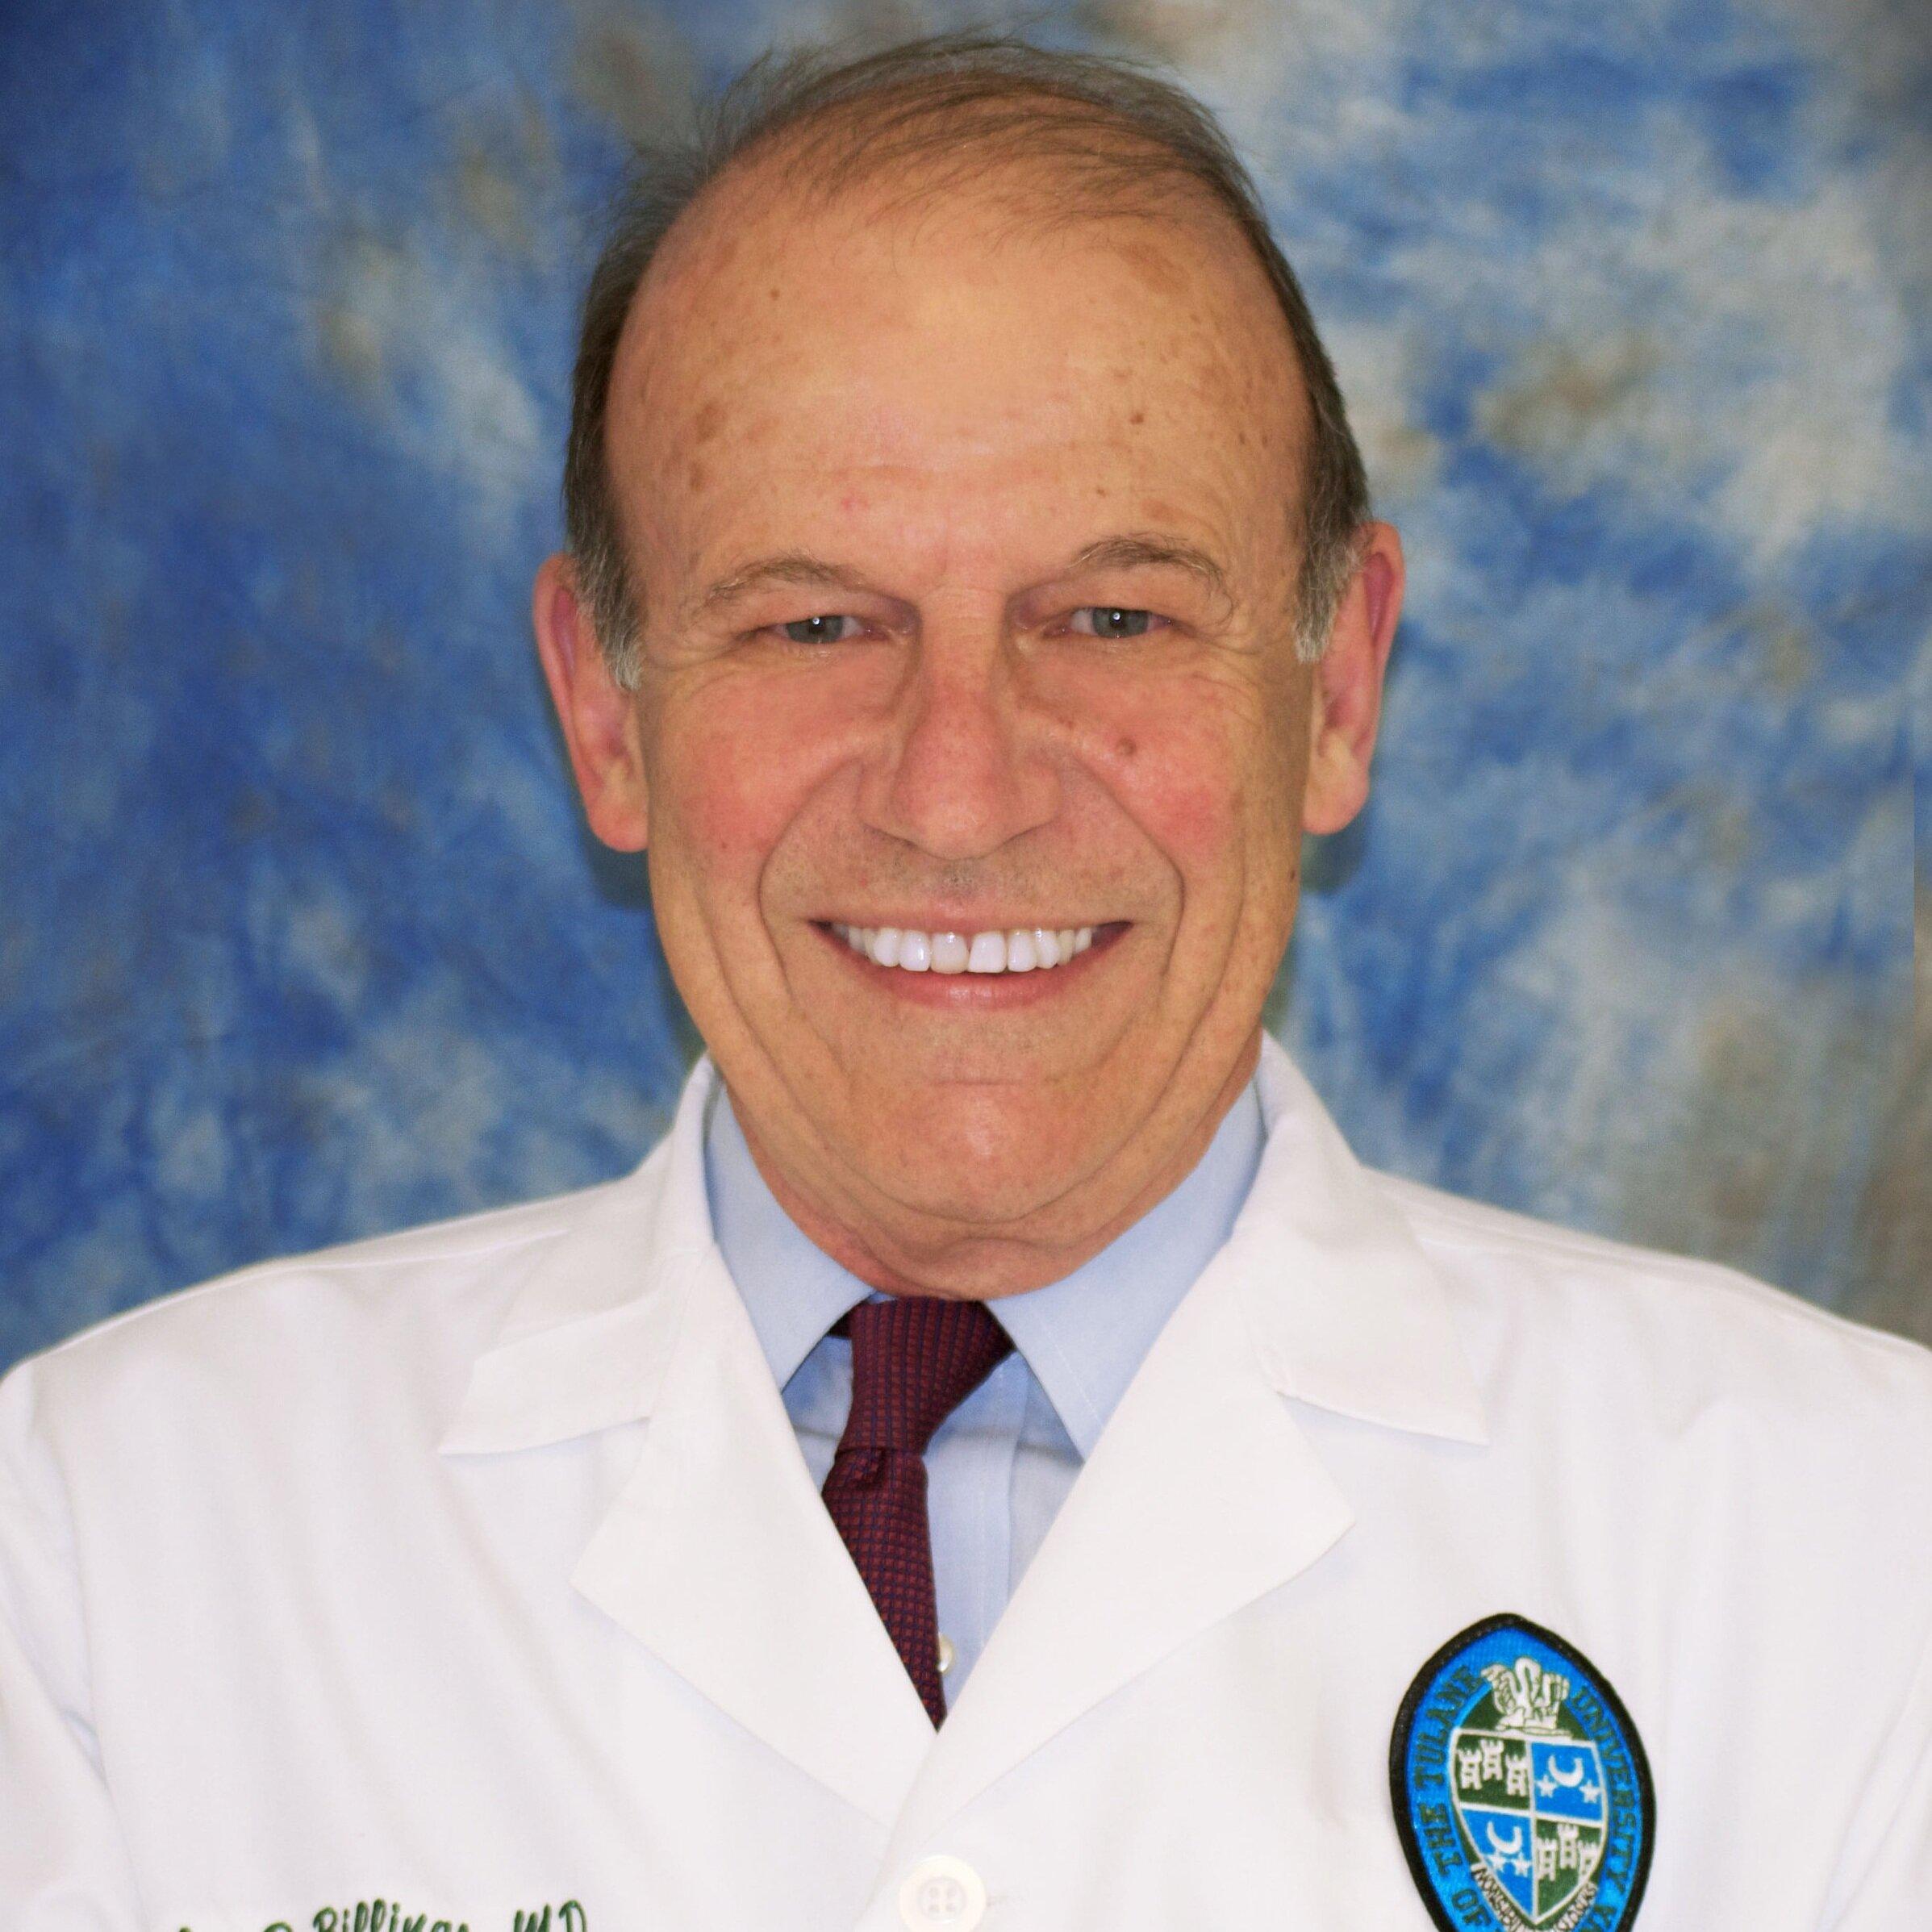 Dr. Charles Billings